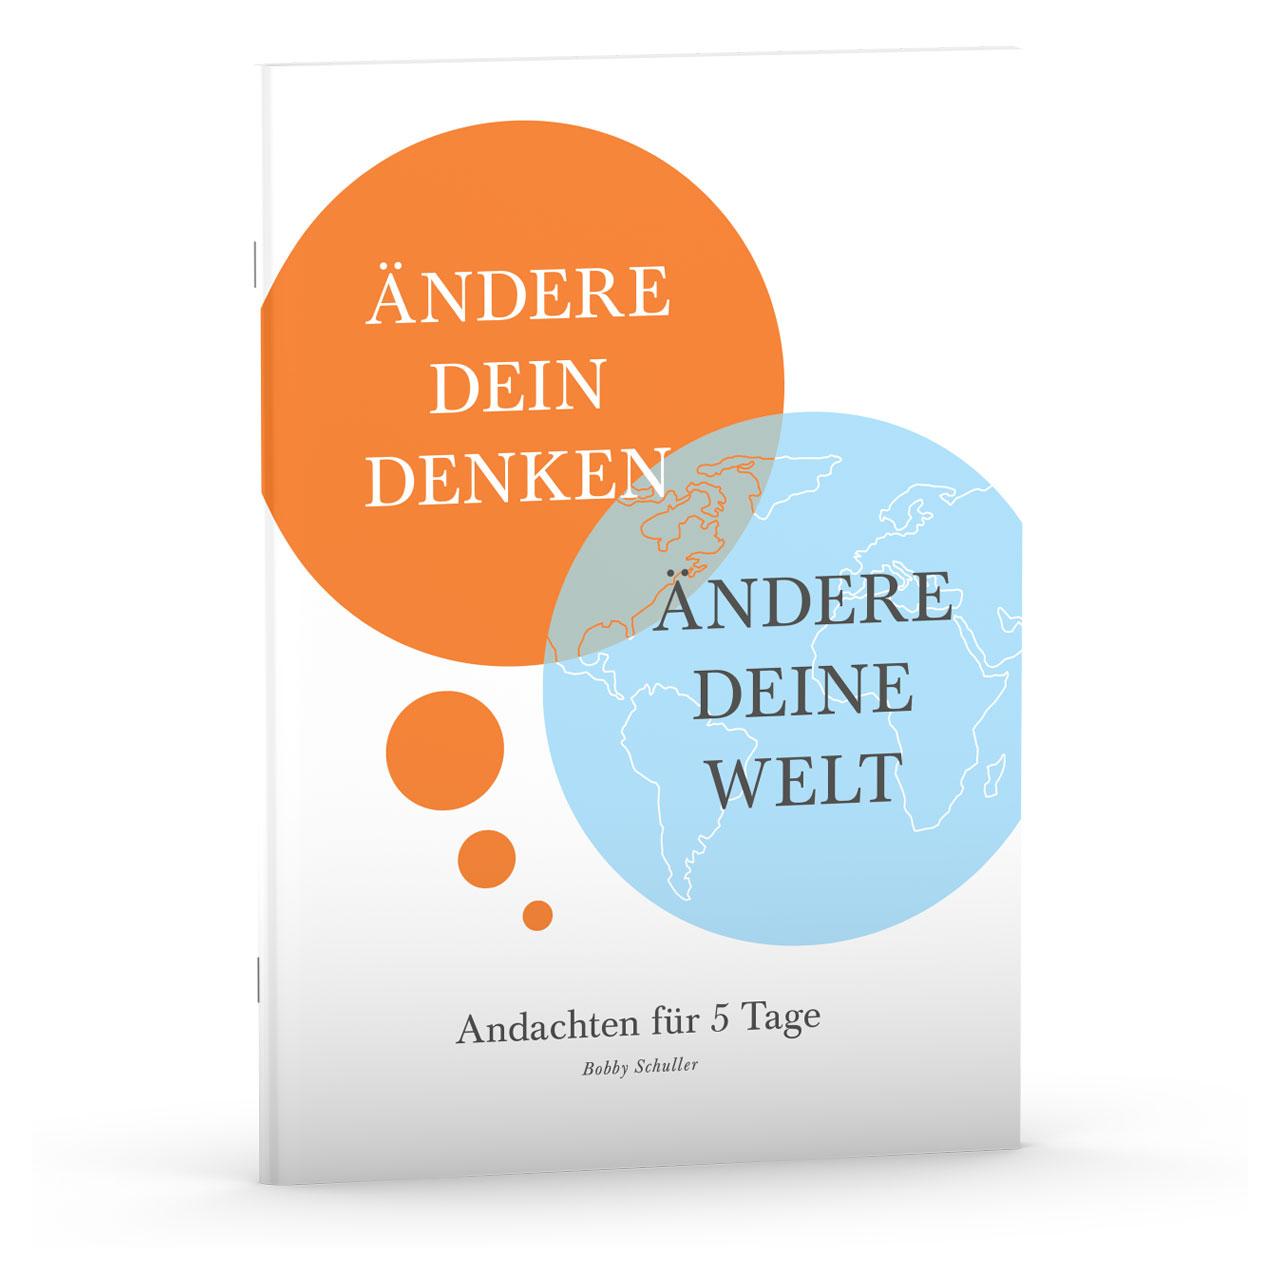 Cover_Aendere-nurAndachtsheft_RGB